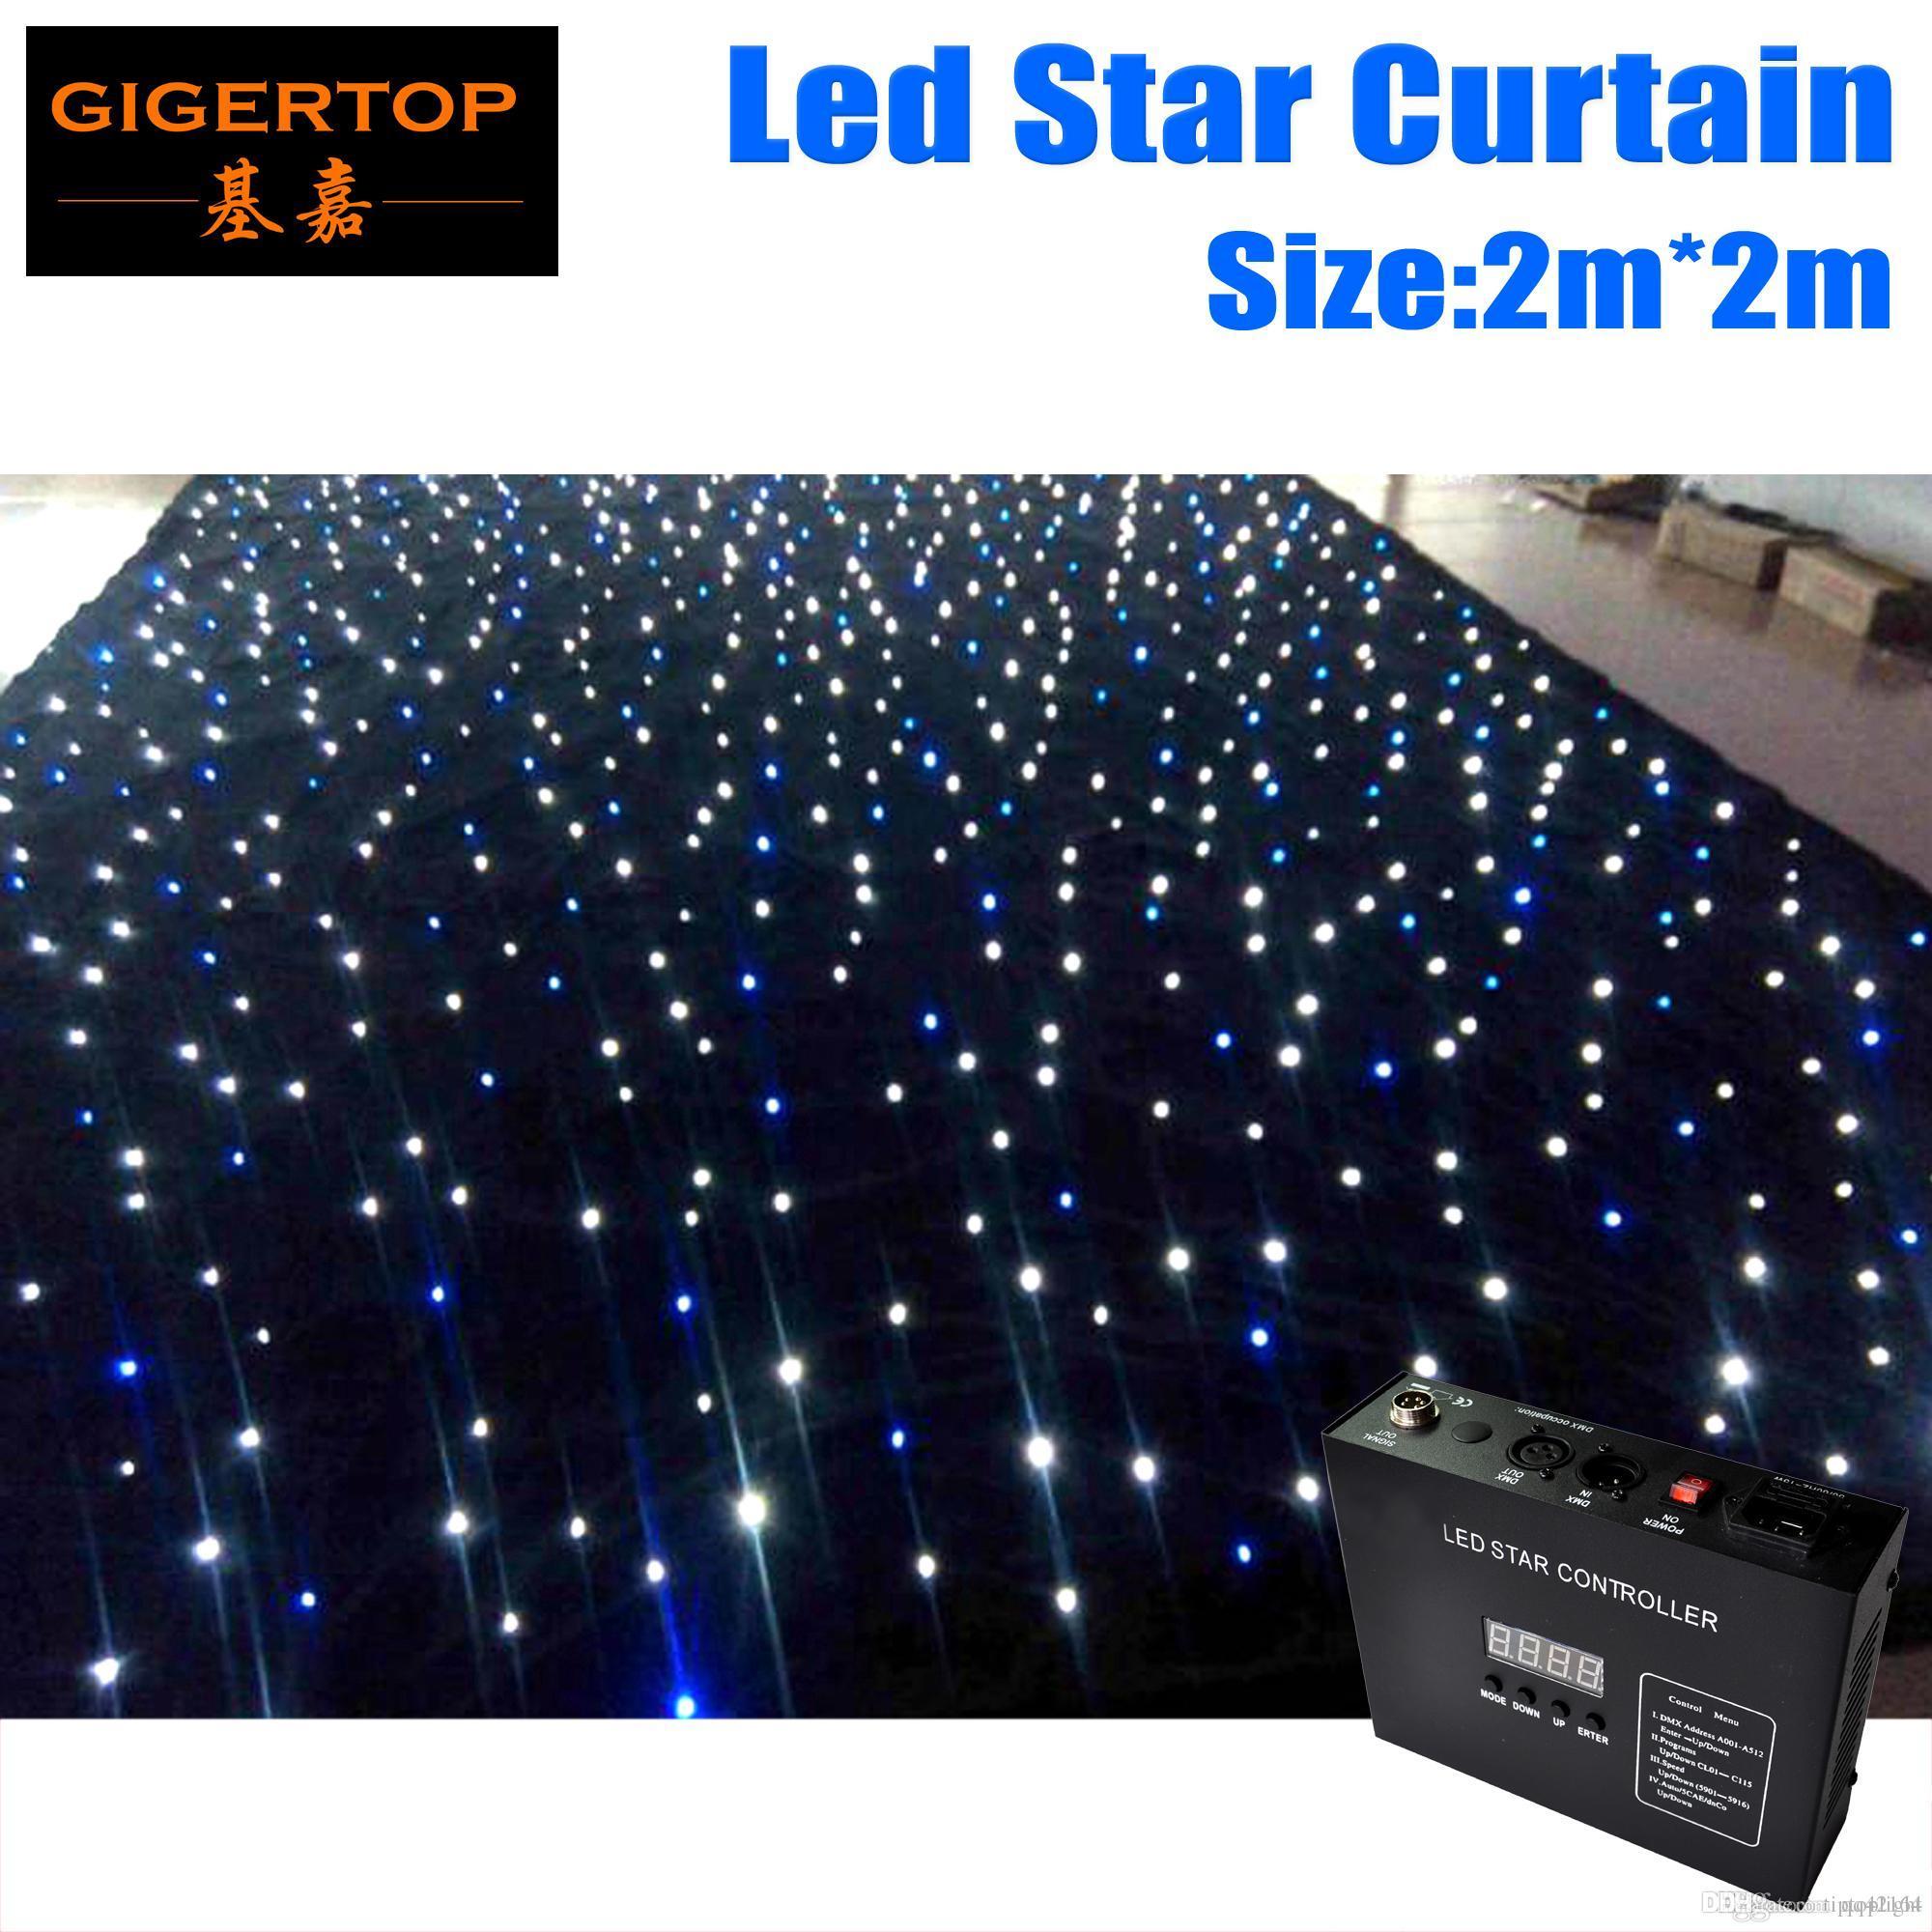 Super Deal anpassen 2M * 2M-Qualitäts-RGBW / RGB-Farben-Vorhang LED-Stern-Tuch mit Controller 90V-240V-Lichtvorhang CERROHS